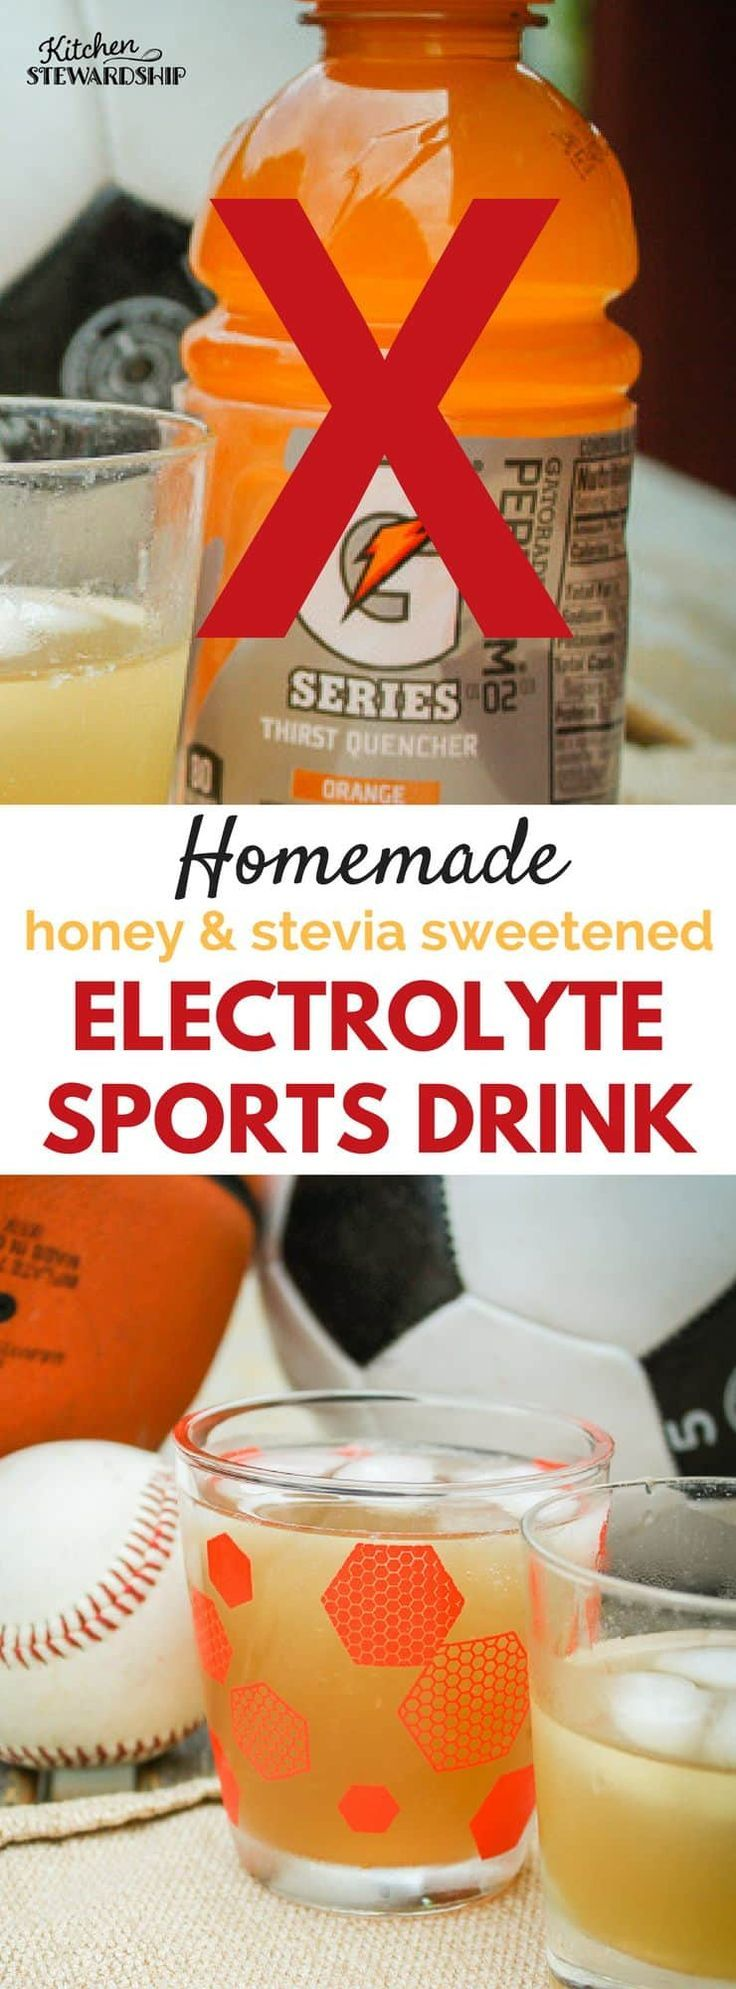 Homemade Electrolyte Sports Drink (Honey & Stevia